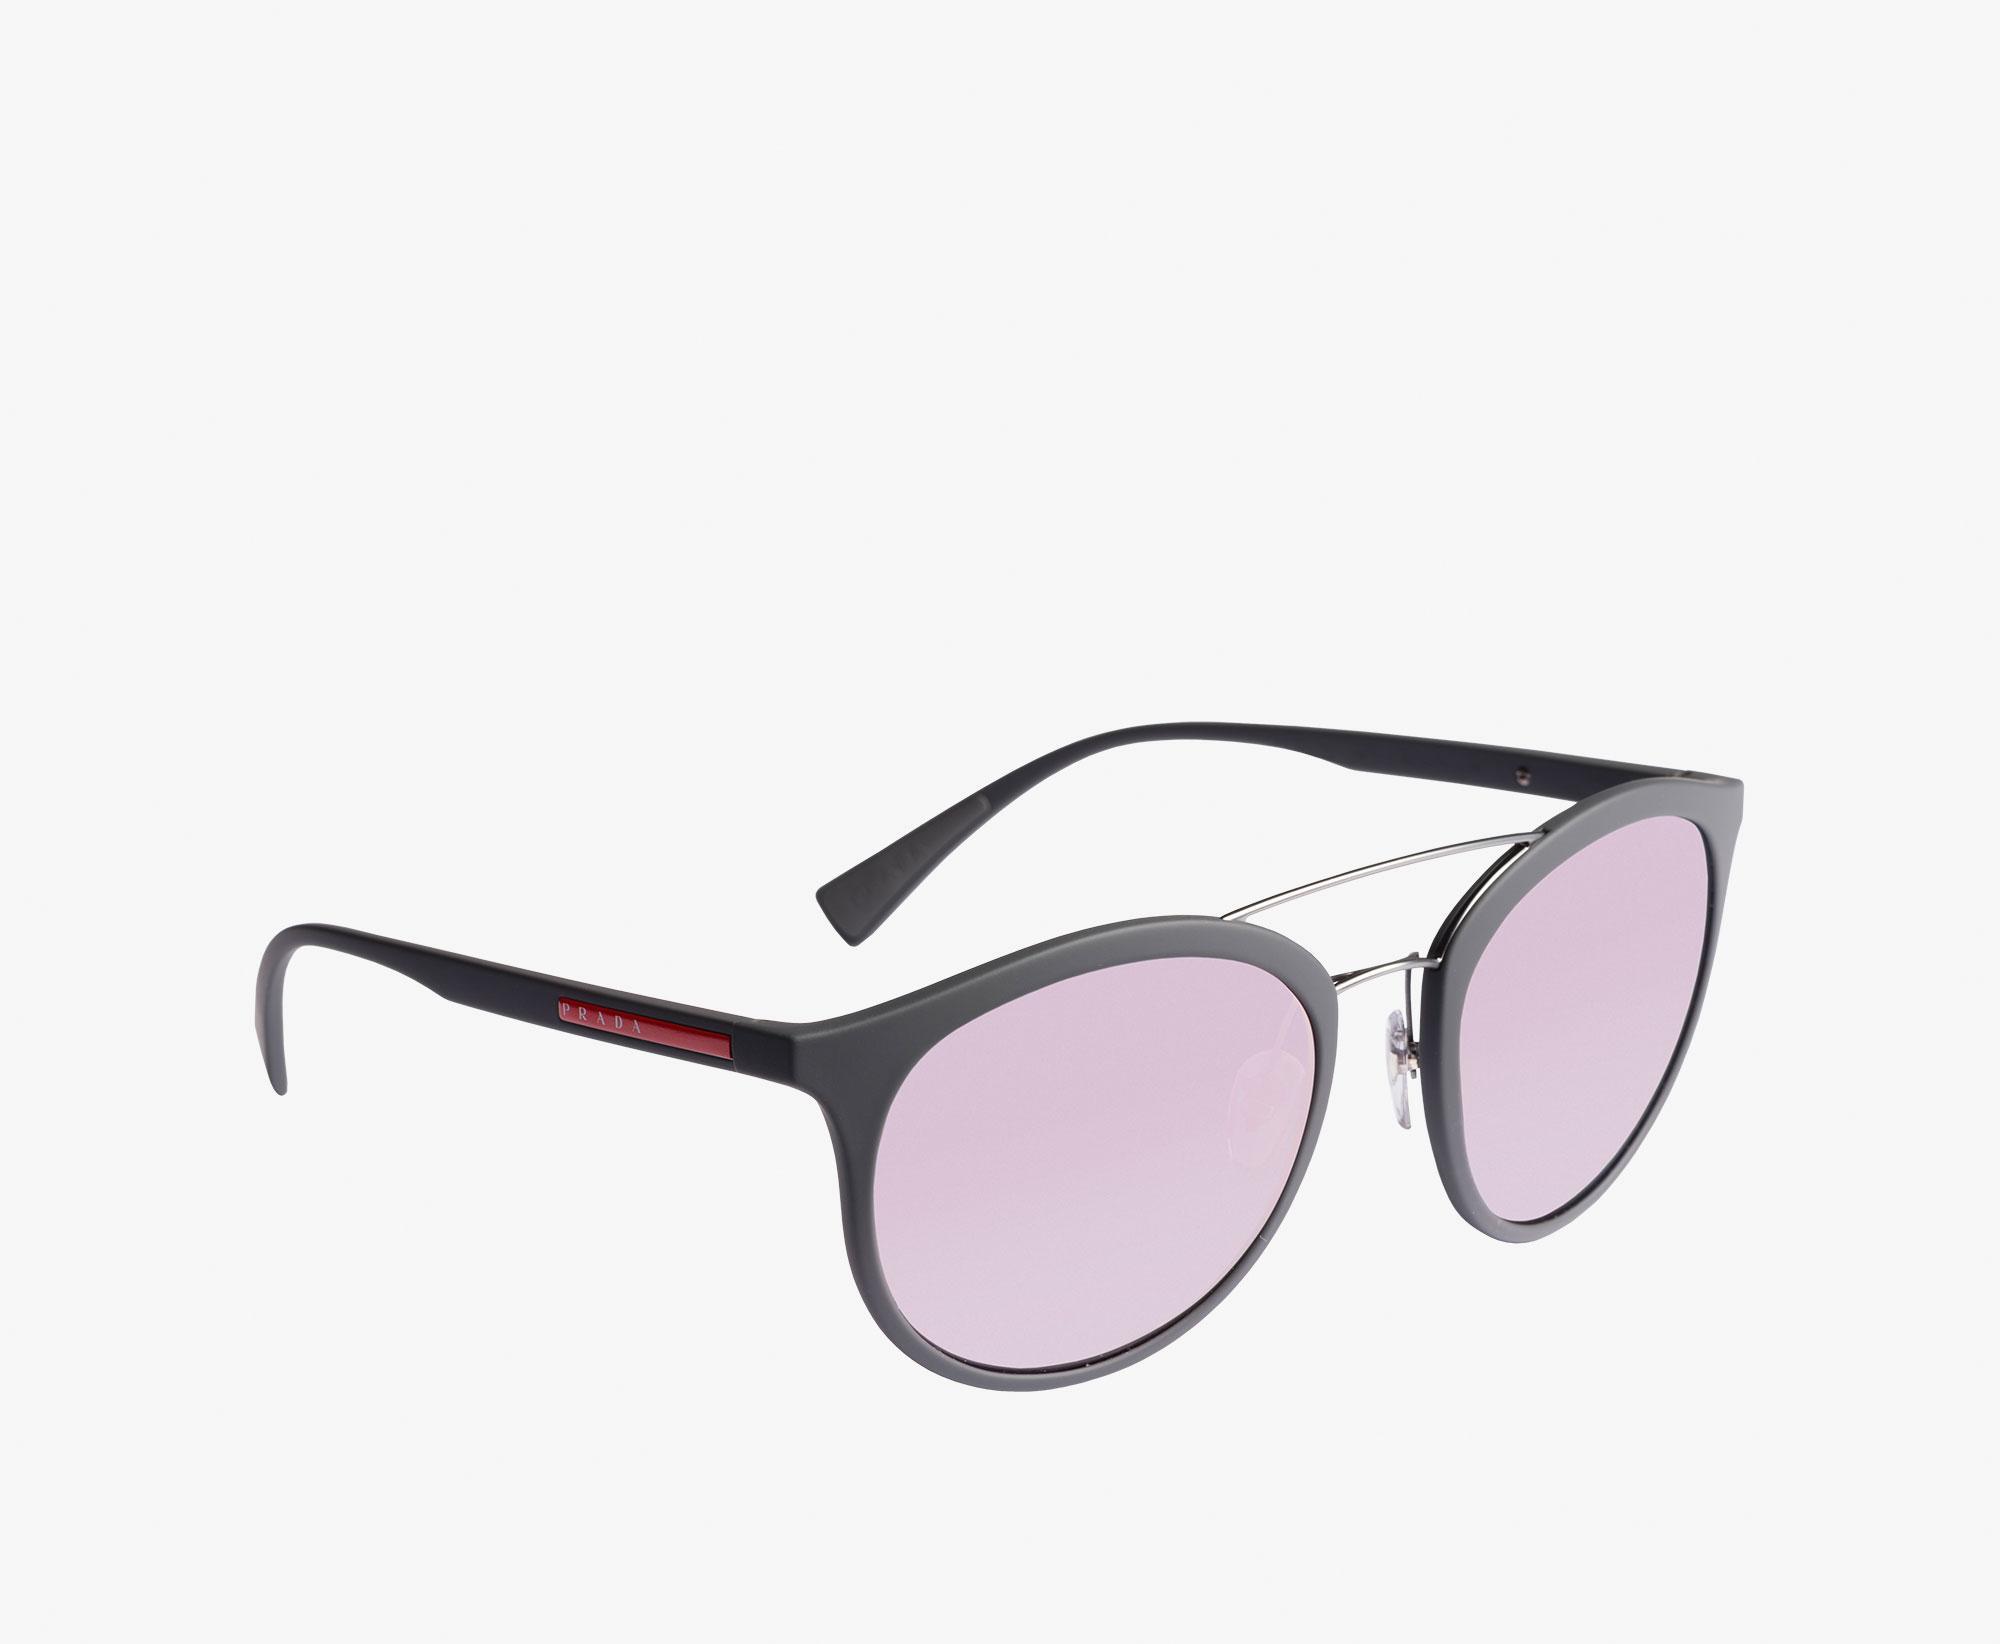 0c54454dee684 Lyst - Prada Linea Rossa Eyewear